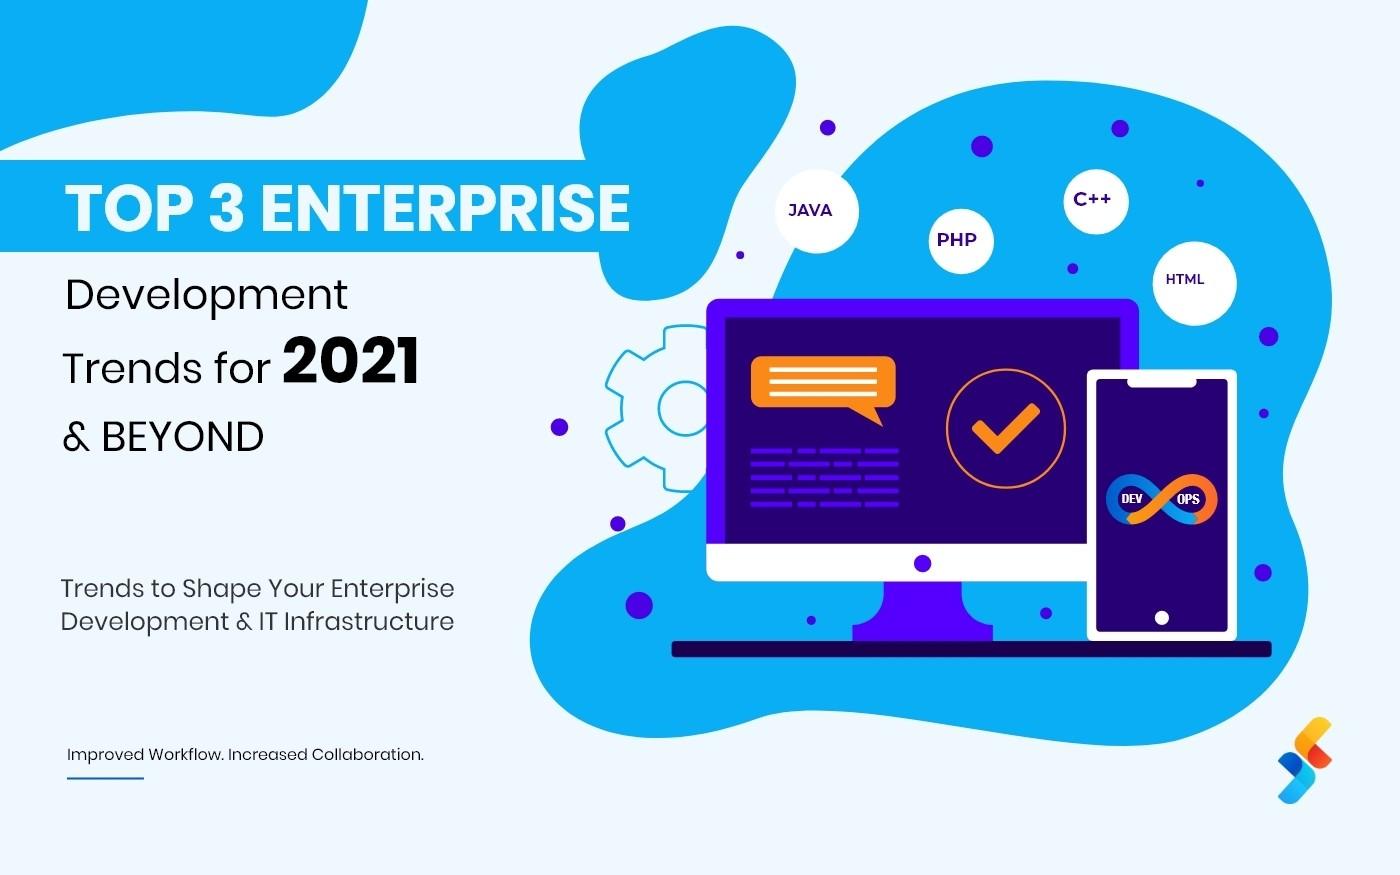 Top 3 Enterprise Developer  Trends for 2021 and Beyond